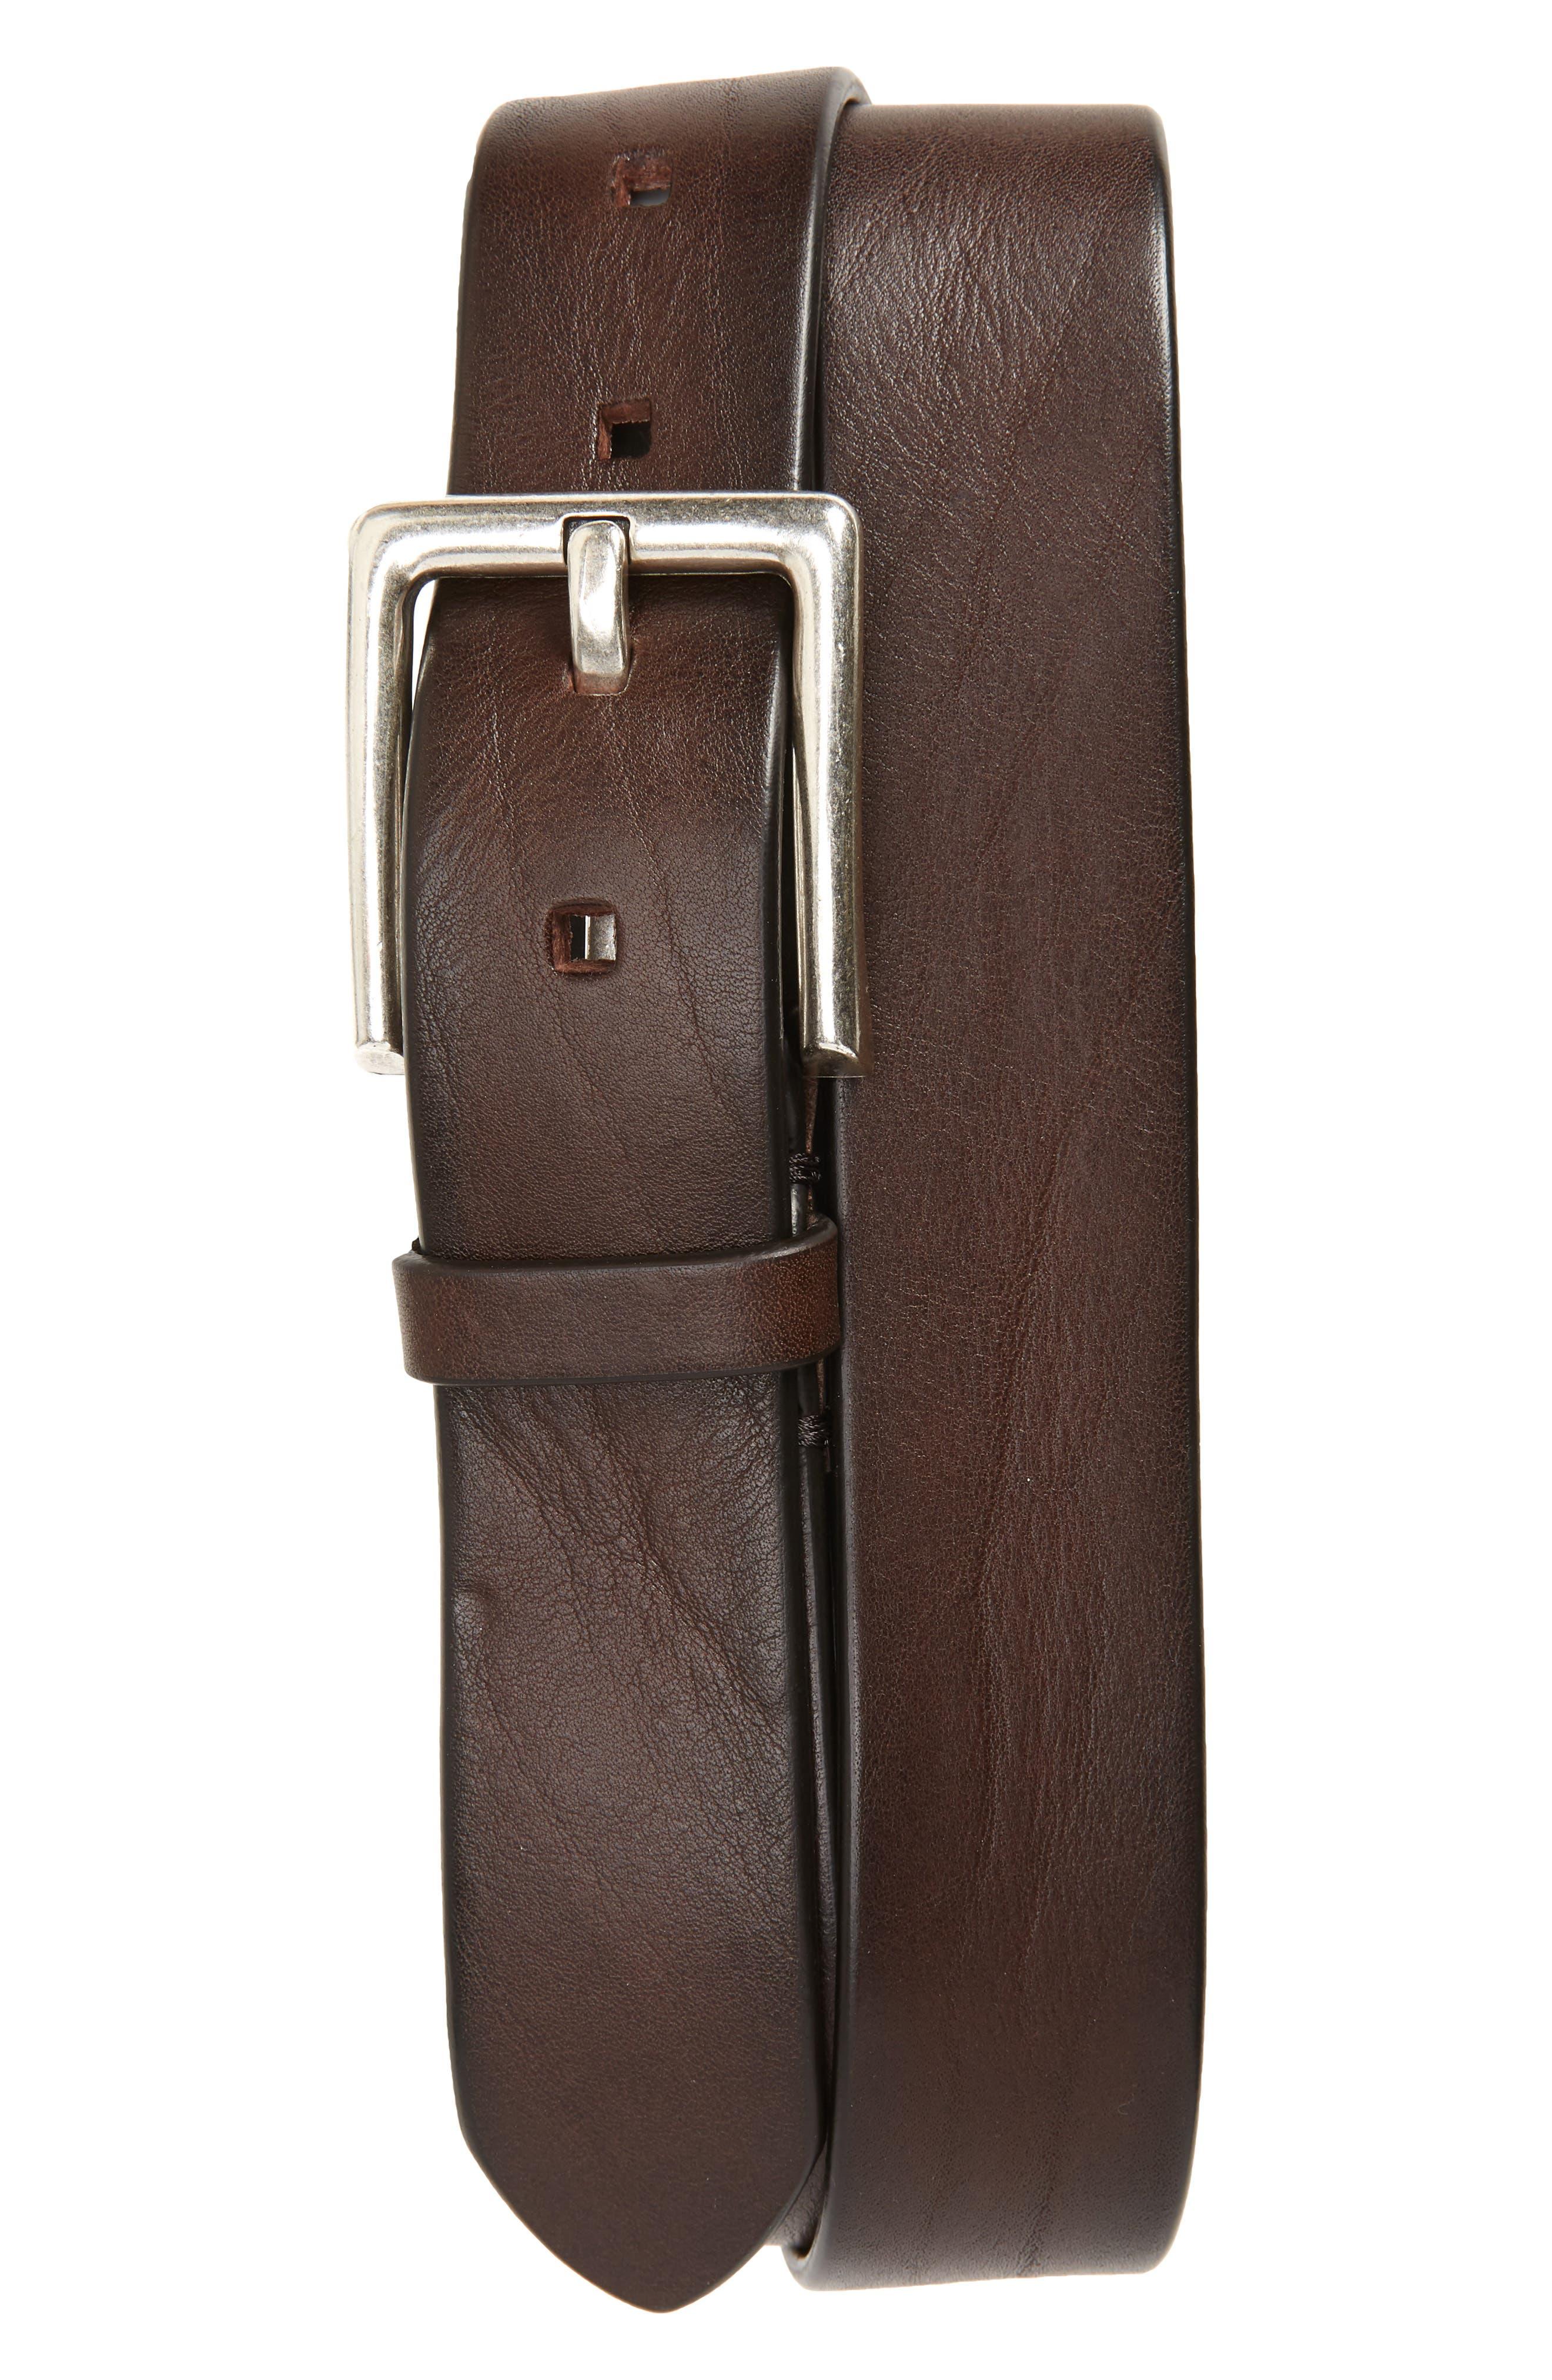 To Boot New York Vachetta Leather Belt, Florida Tmoro